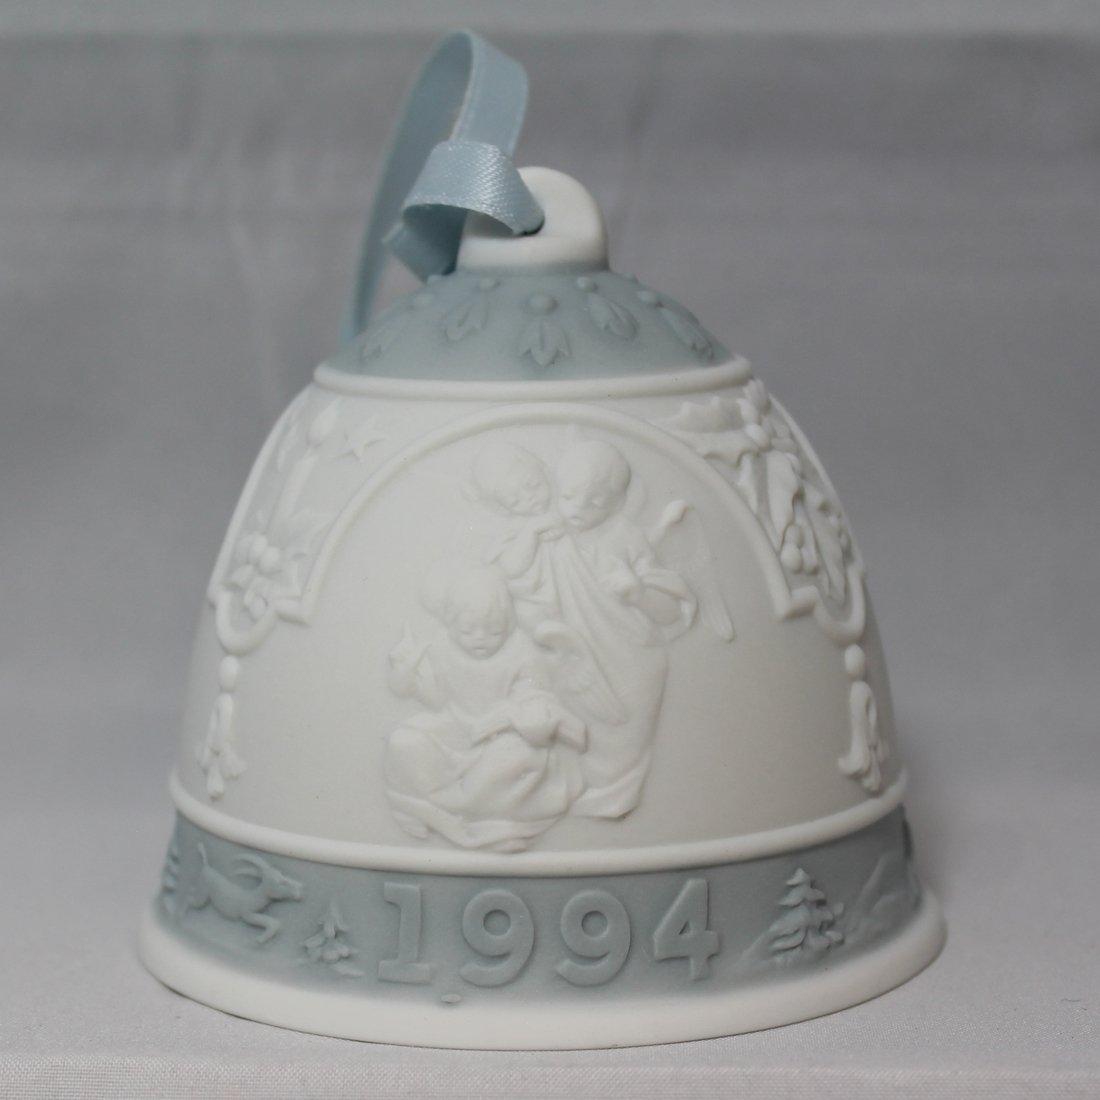 1994 Lladro Christmas Bell Campana Navidad #16139 Angels with Musical Instruments